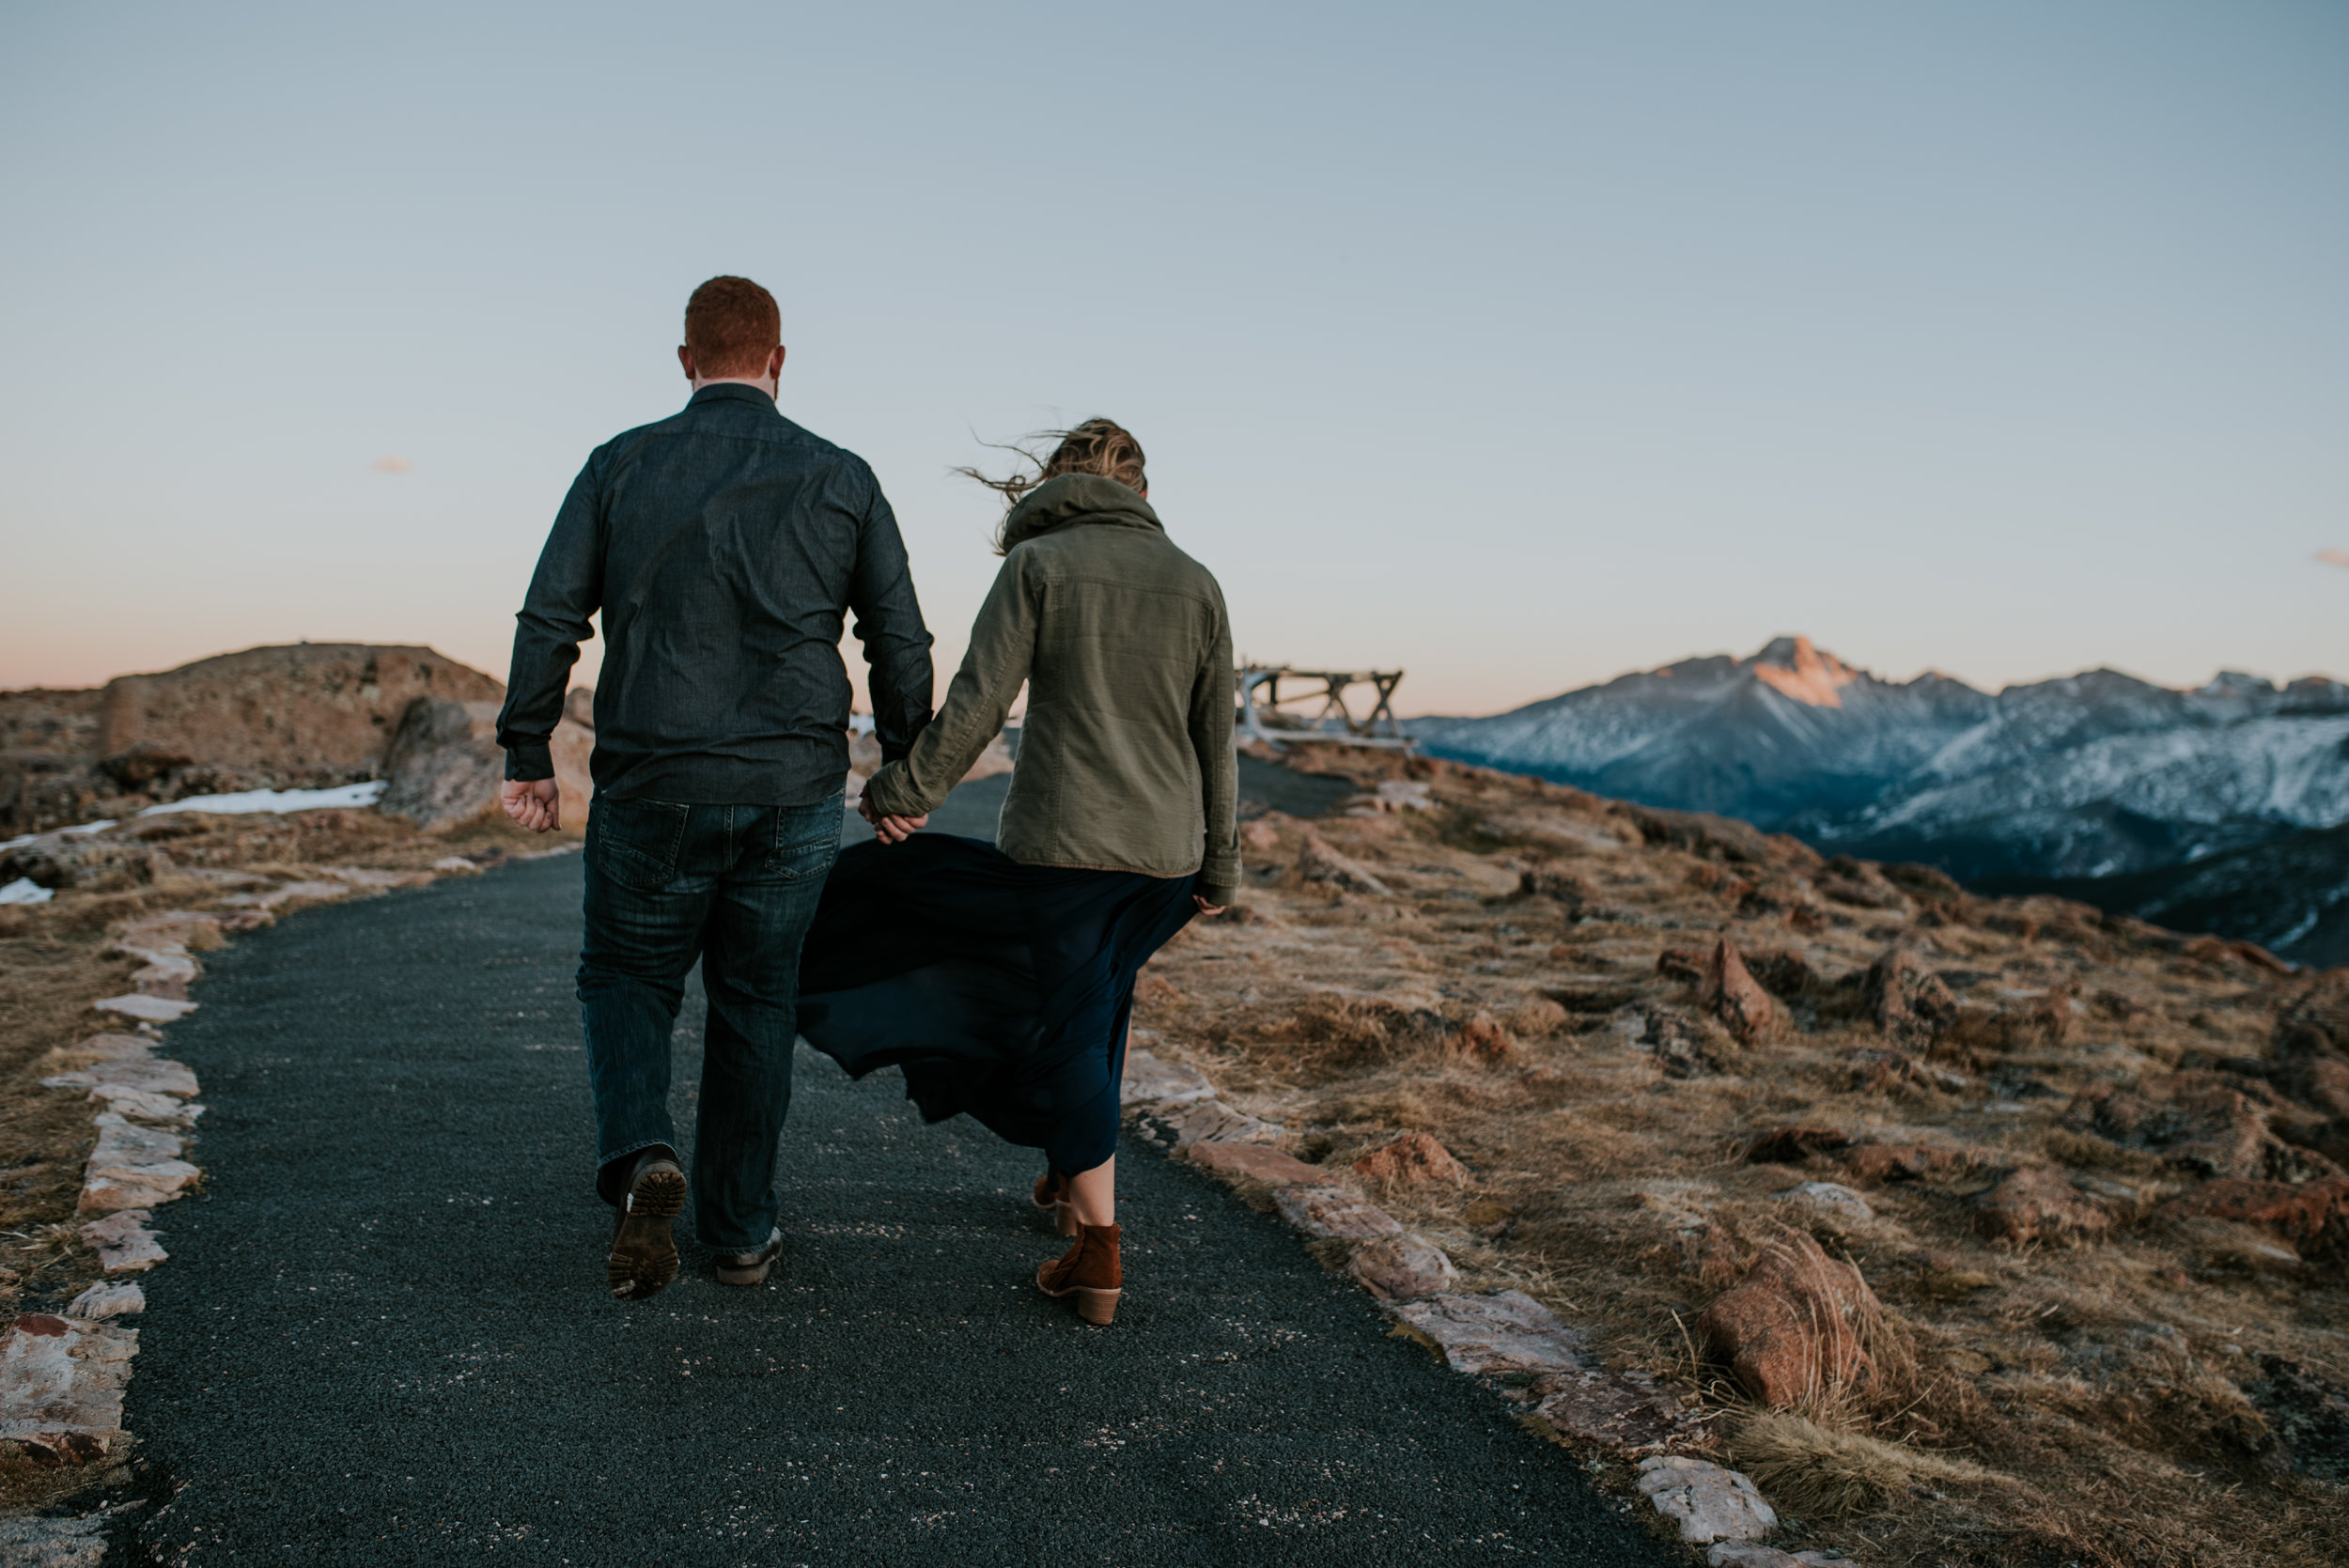 Romantic Windy Rocky Mountain National Park Engagement Photographer-26.jpg